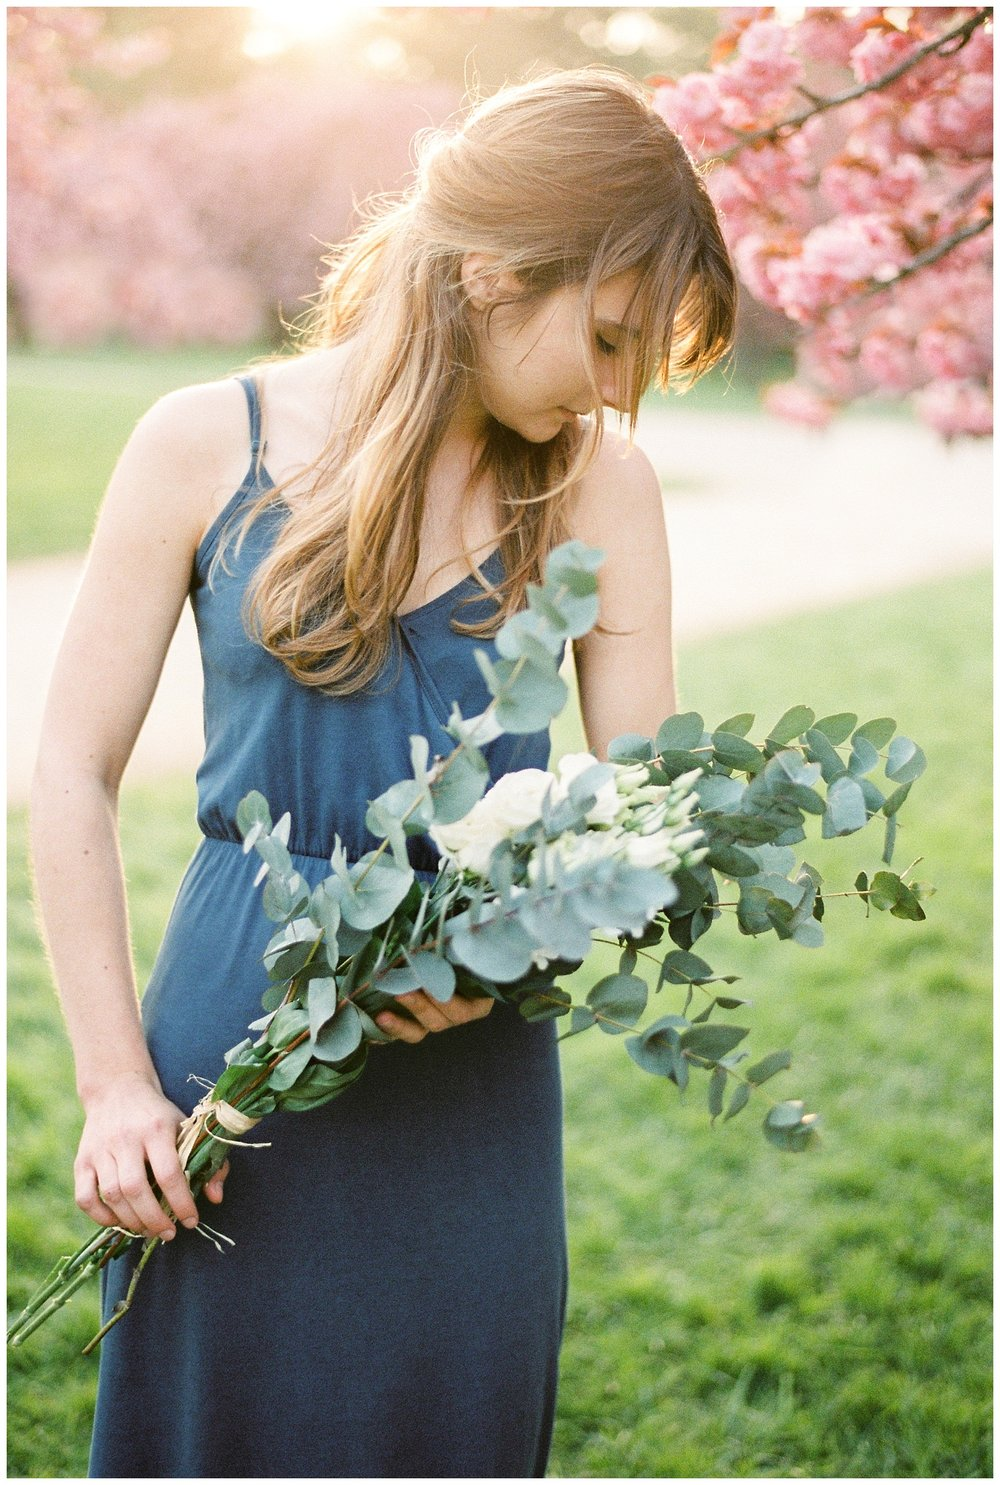 Spring_Gaetan_Jargot_0003.jpg